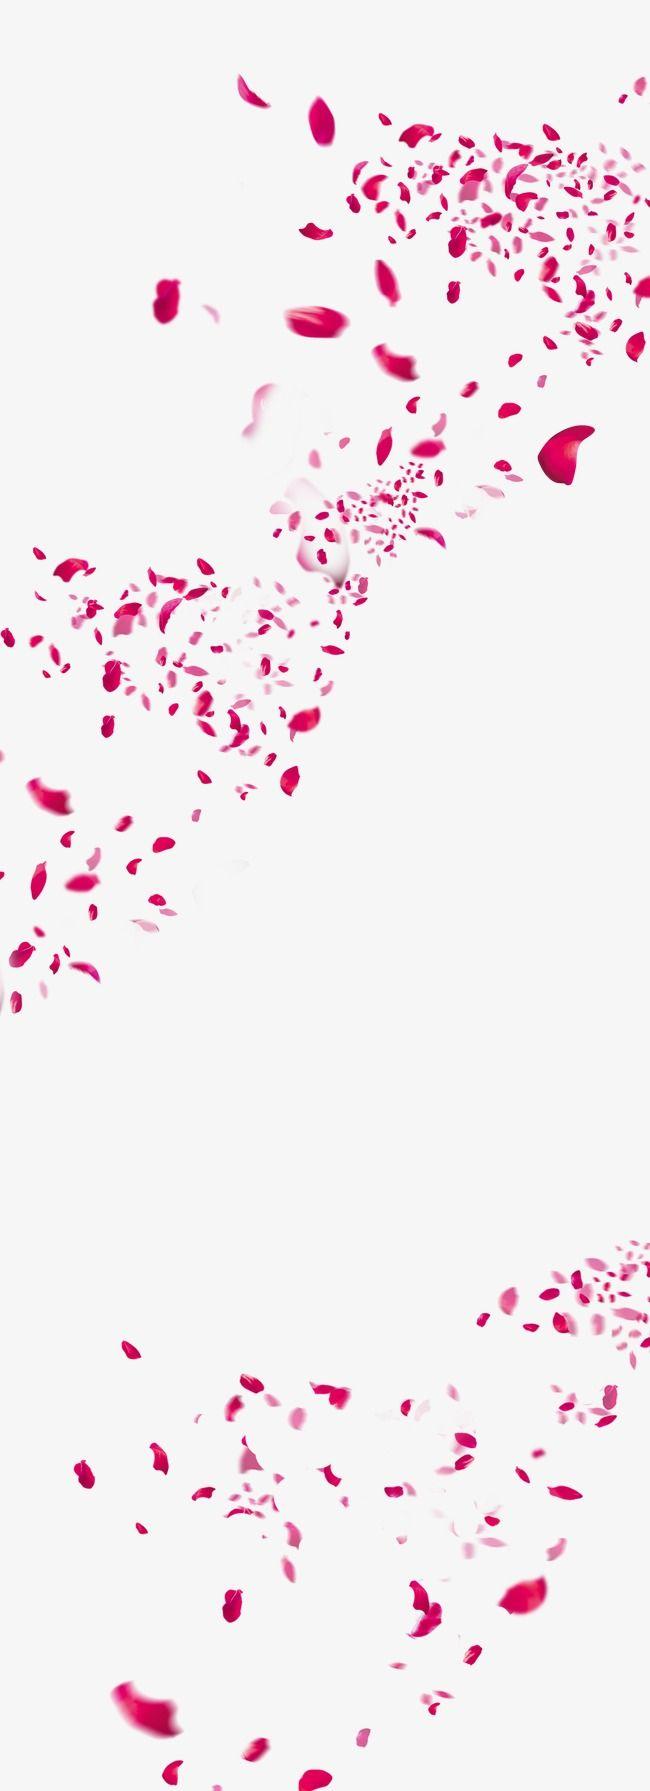 Flores Cor De Rosa Petalas De Flores Decoracao De Festas De Casamento Petalas Caem As Petalas De Rosas Rose Petals Falling Real Rose Petals Flower Petals